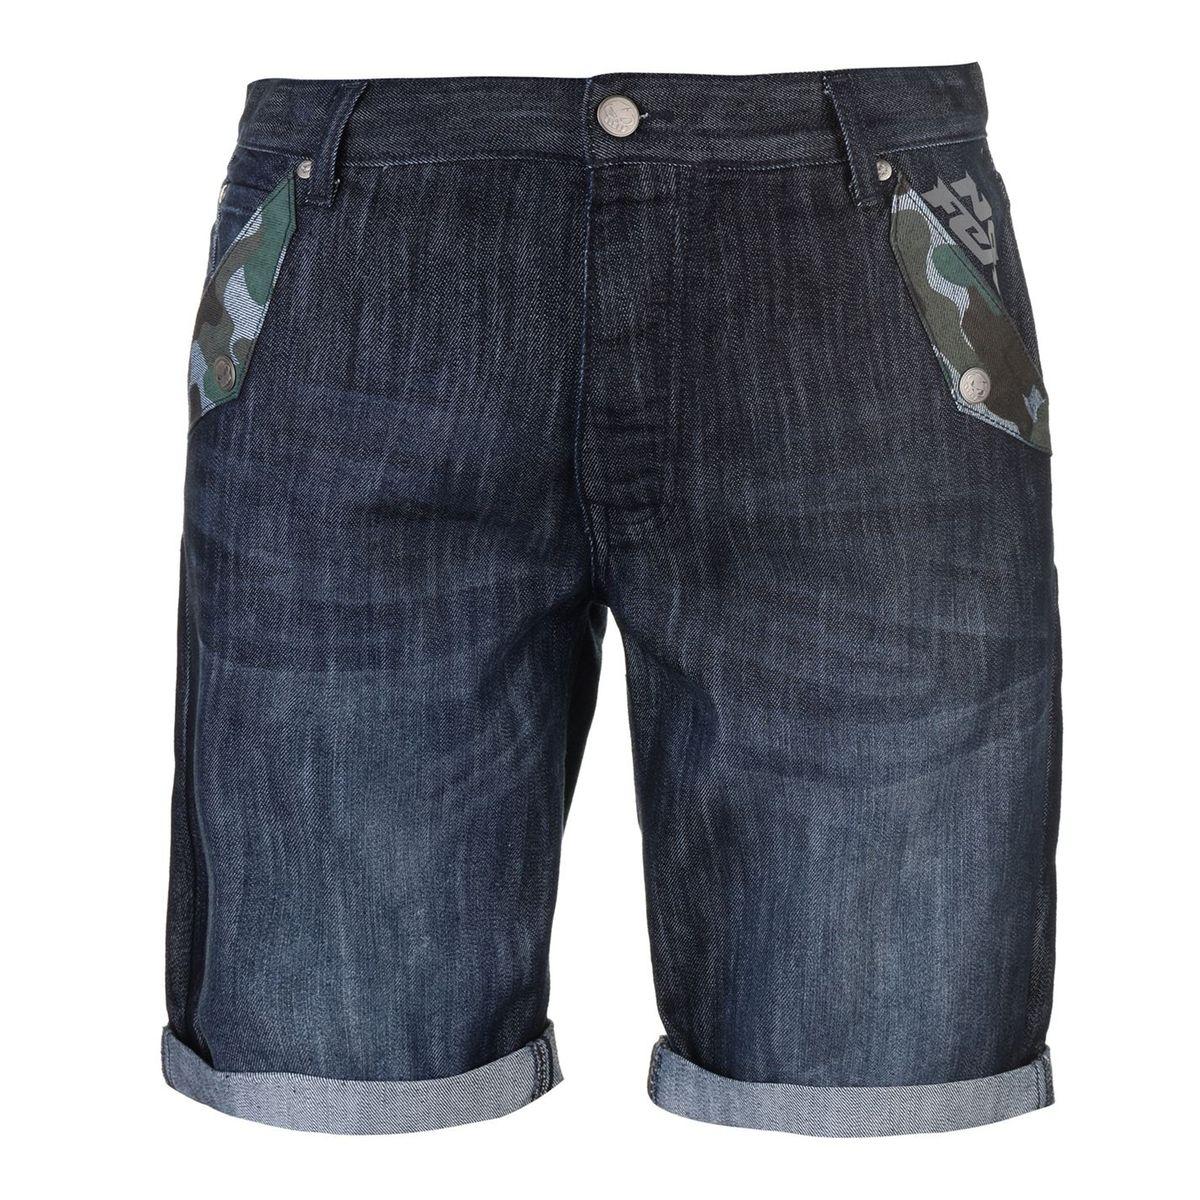 Short en jean denim imprimé